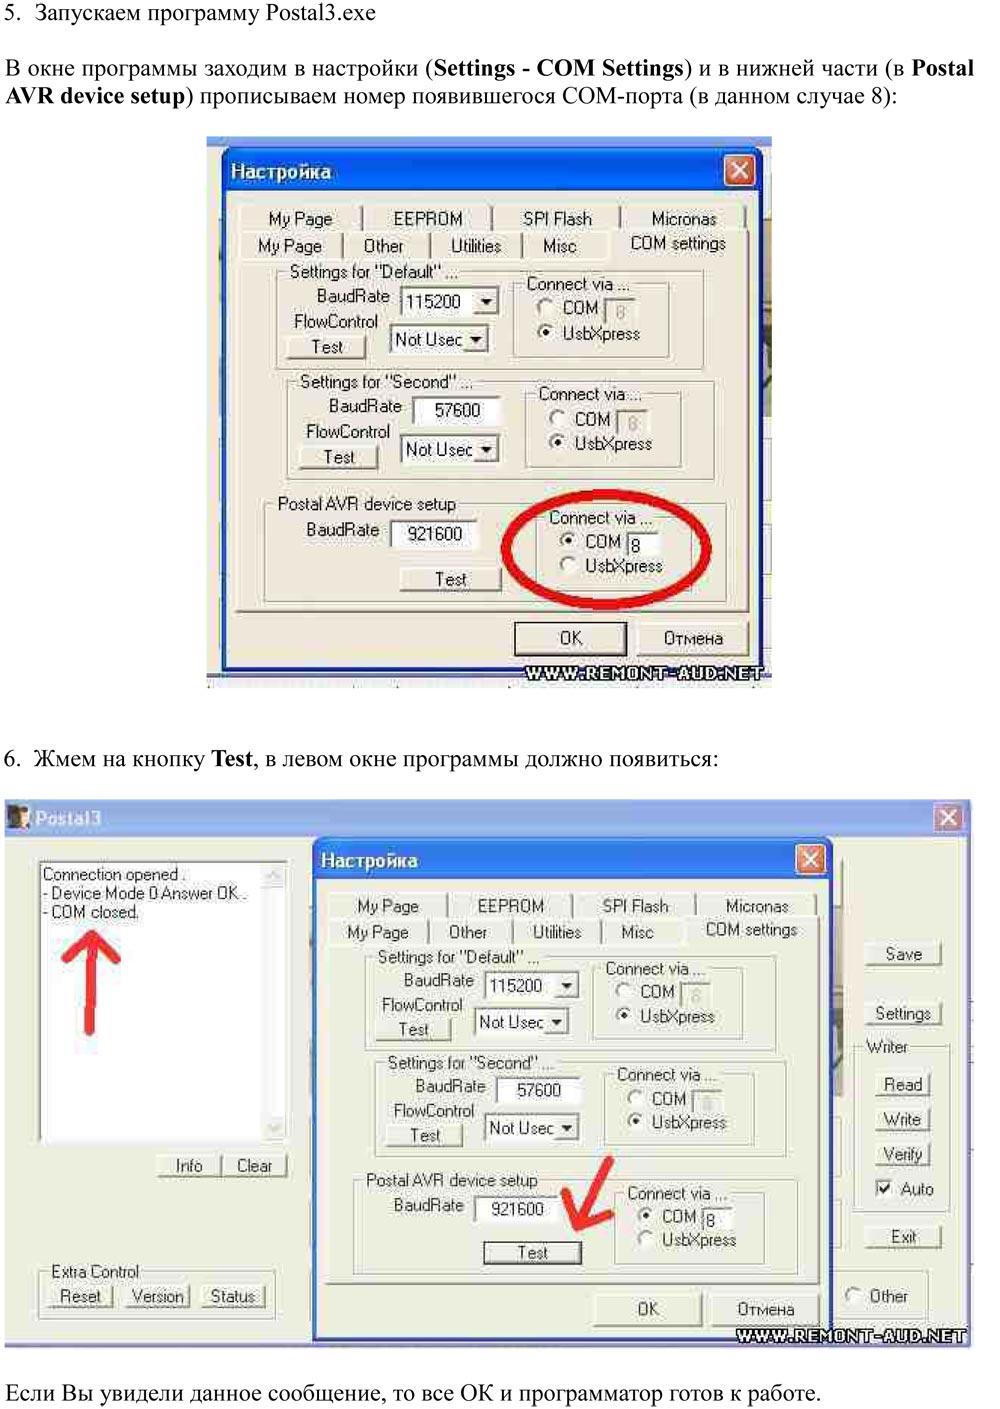 Инструкция по сборке и настройке программатора Postal3 - FULL в корпусе. Страница 3